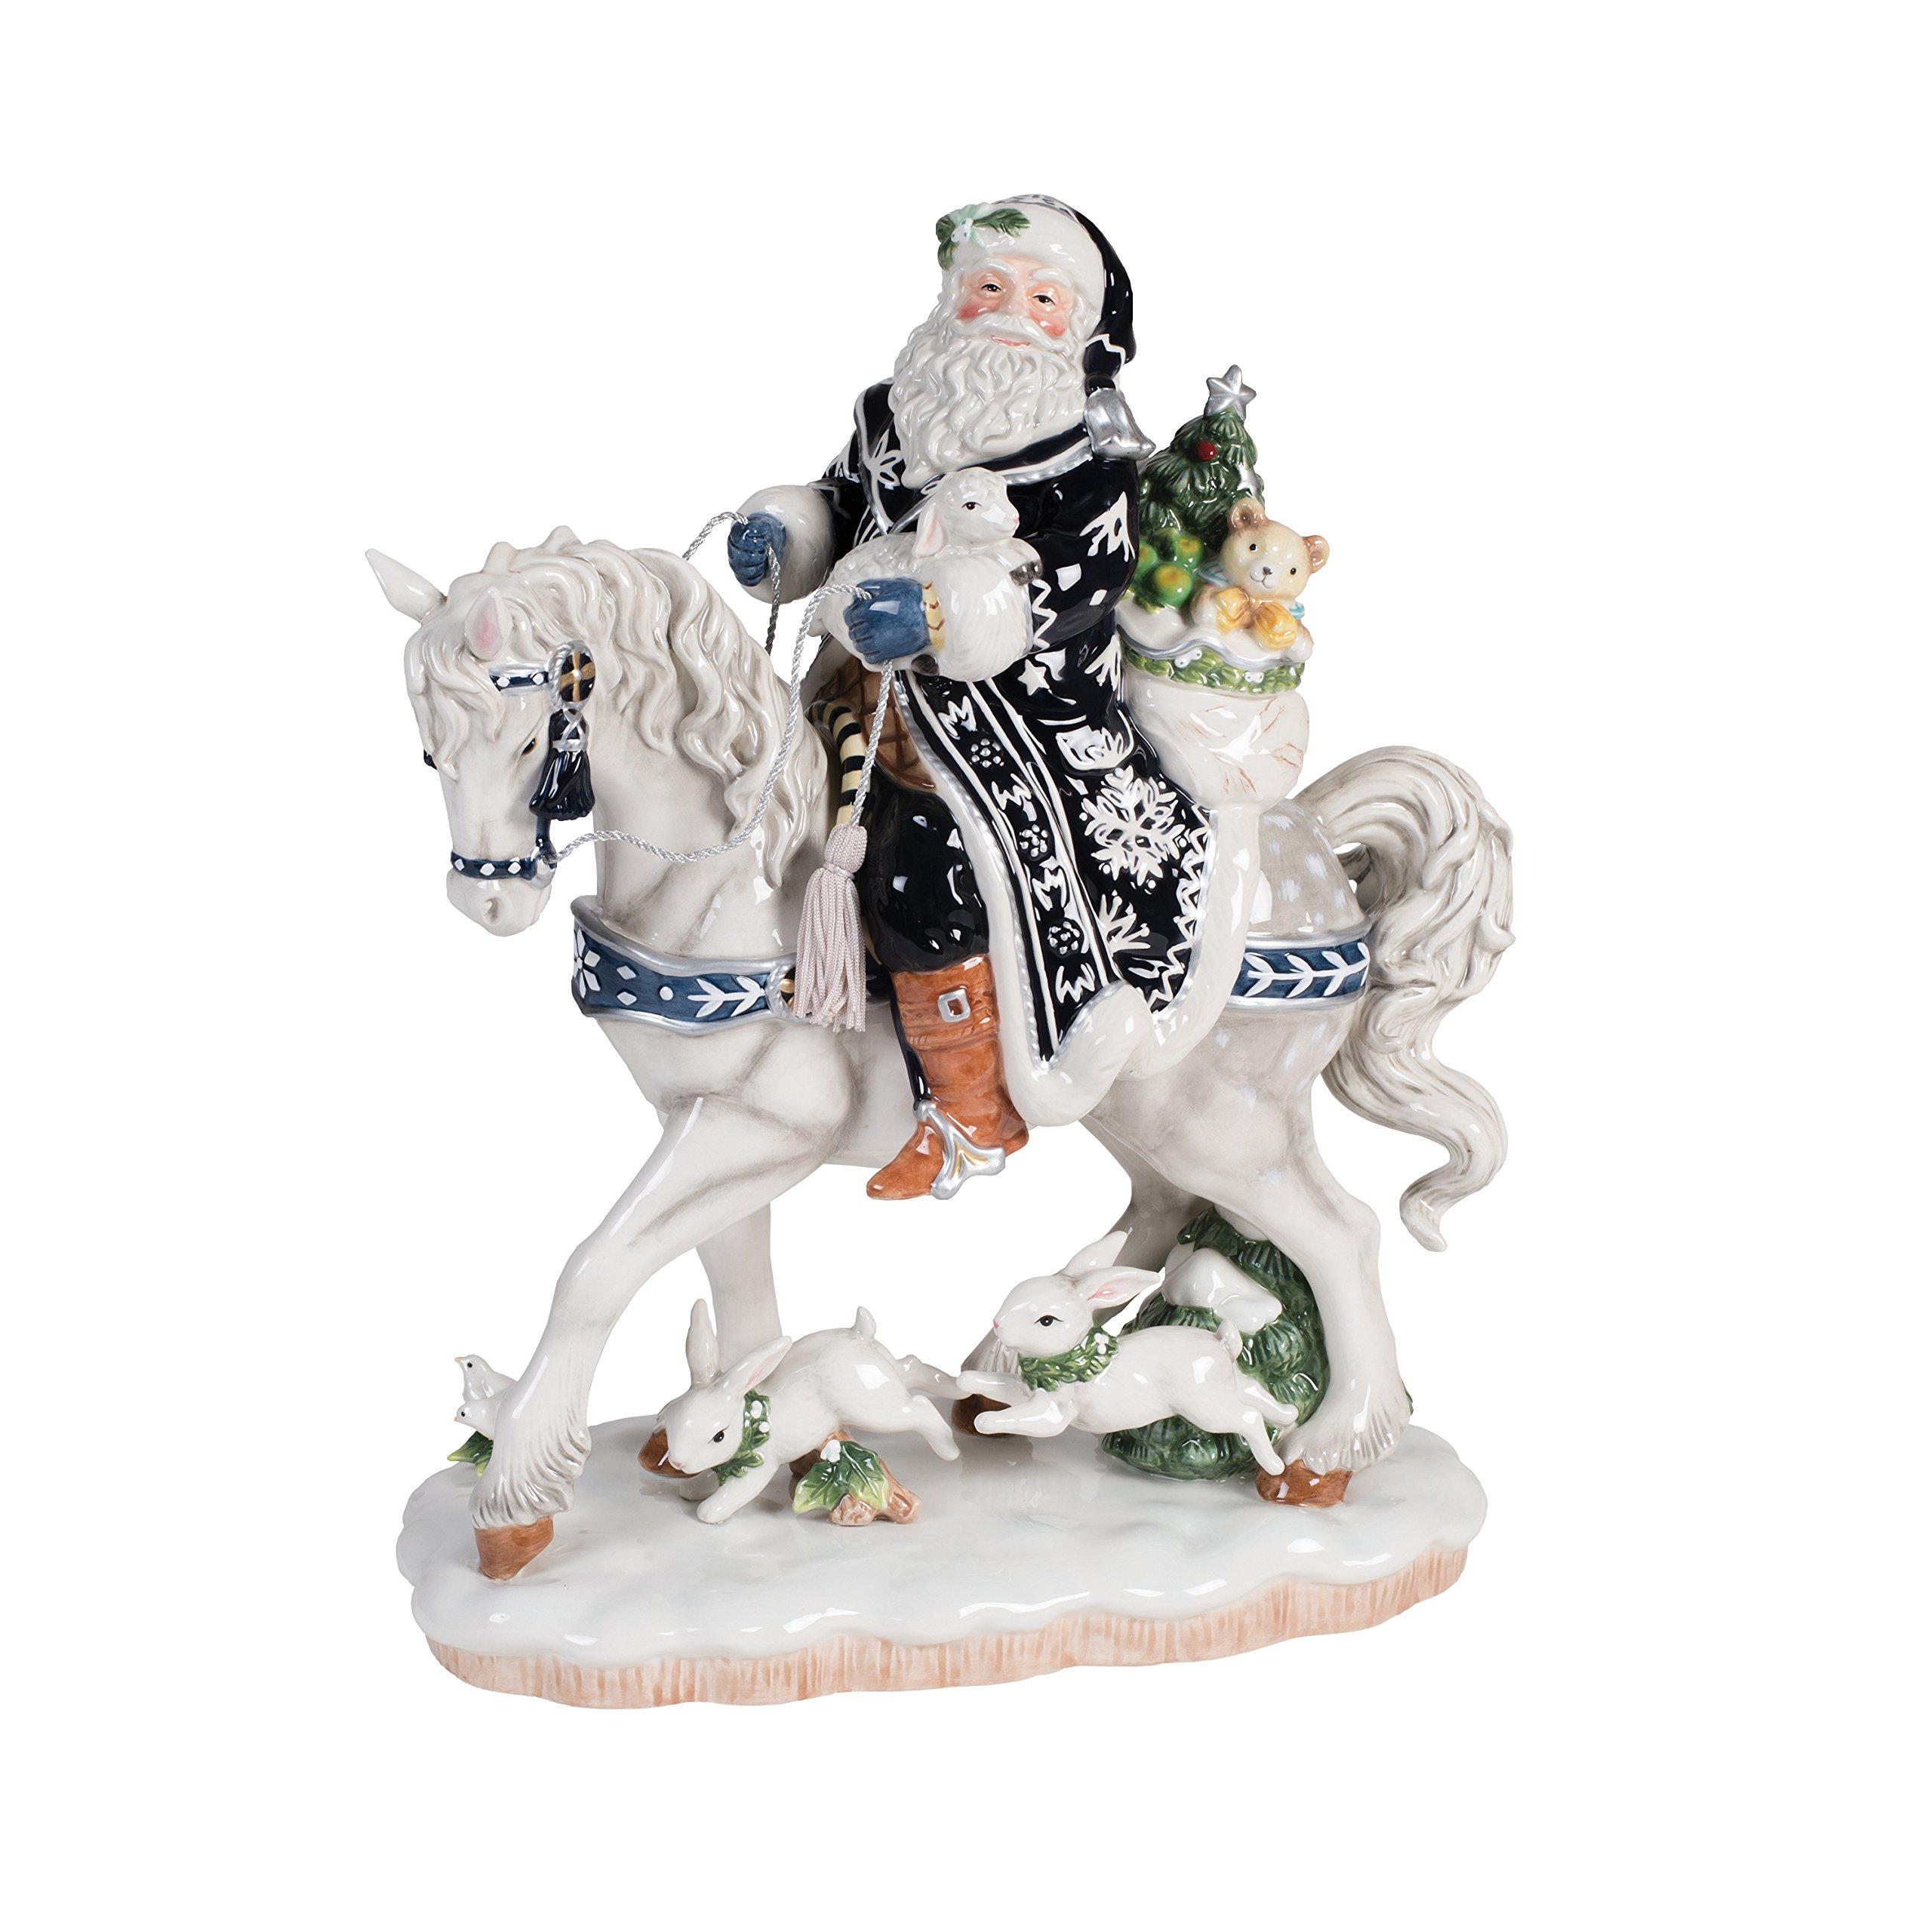 Fitz and Floyd Bristol Holiday Santa on Horse Figurine, Blue/White